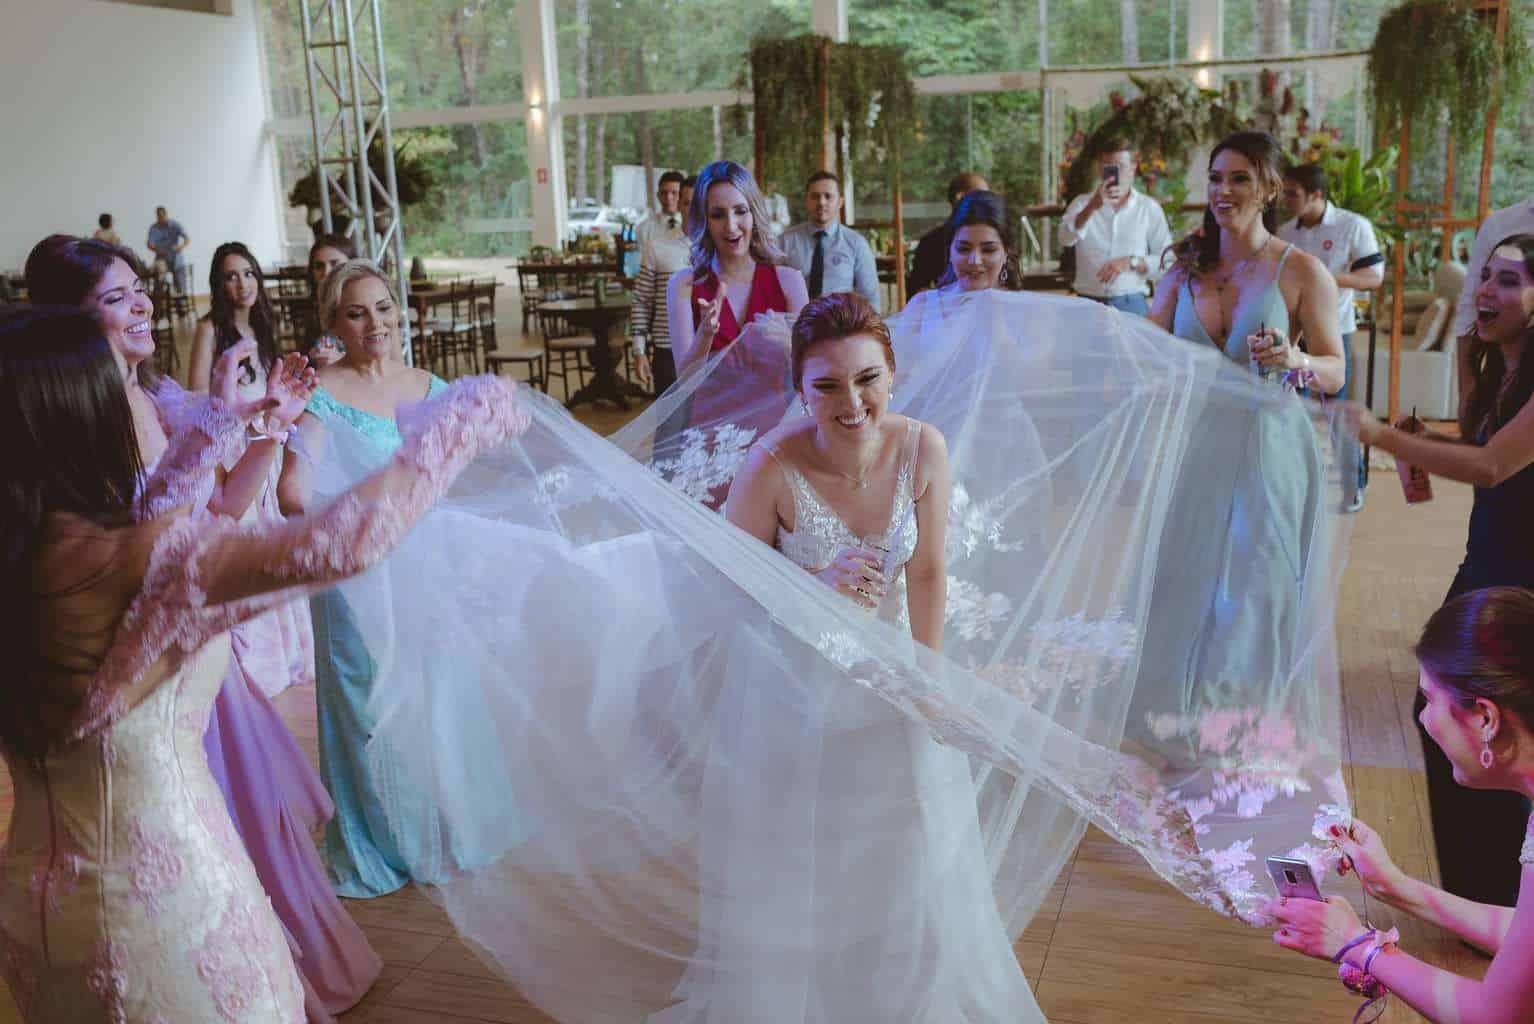 casamento-ao-ar-livre-casamento-boho-casamento-geek-casamento-rustico-casamento-Thais-e-Pedro-festa-Revoar-Fotografia-Villa-Borghese-Eventos-87